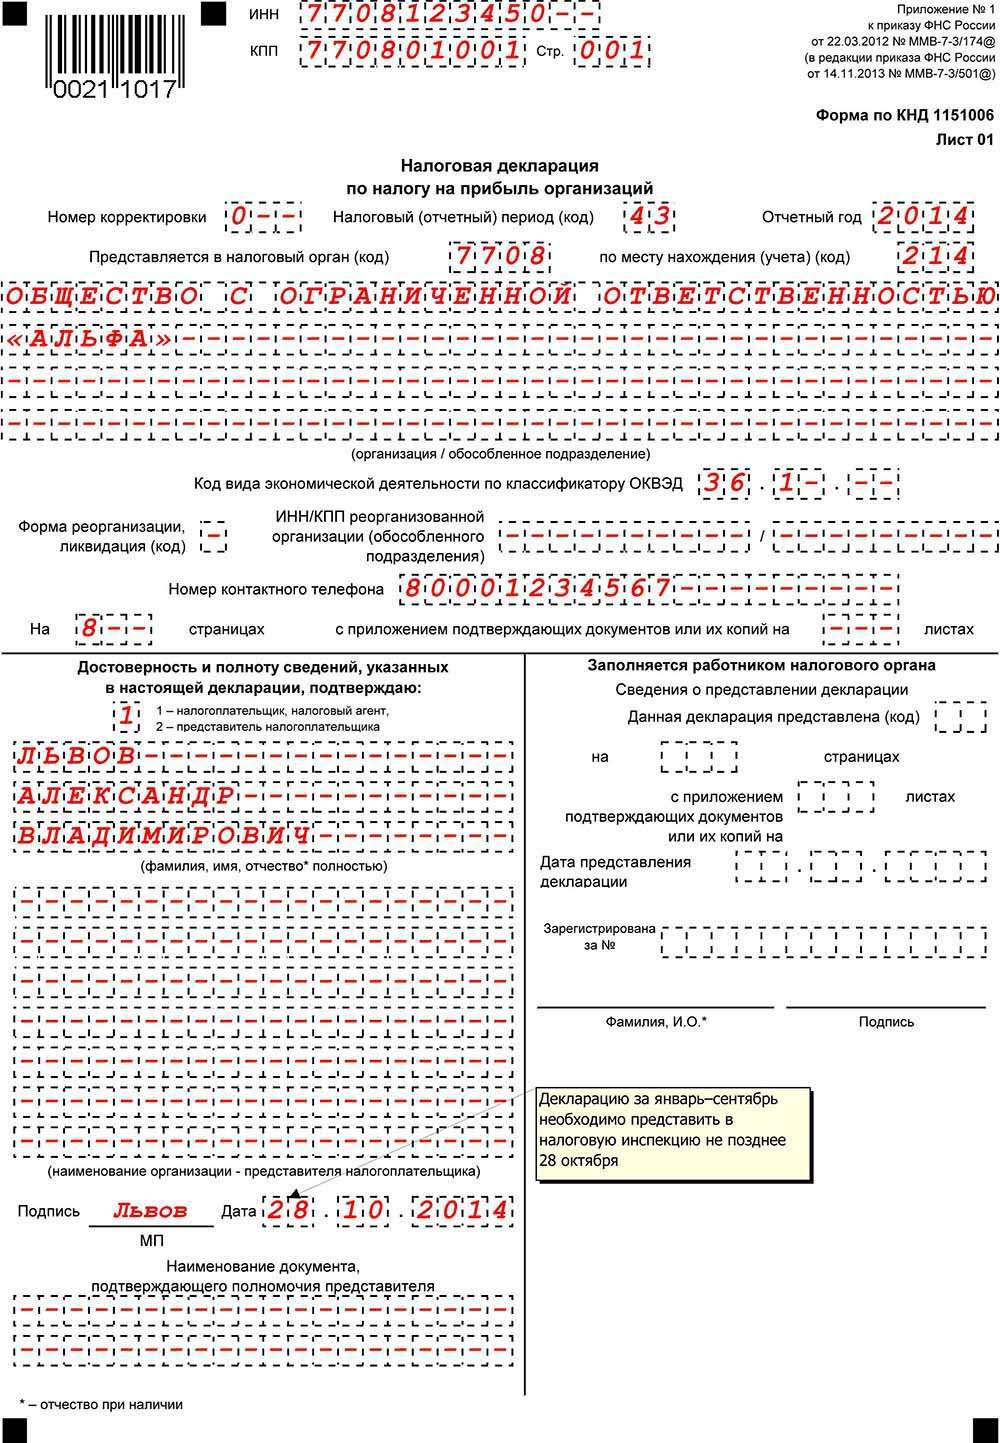 бланк декларации налога на имущества